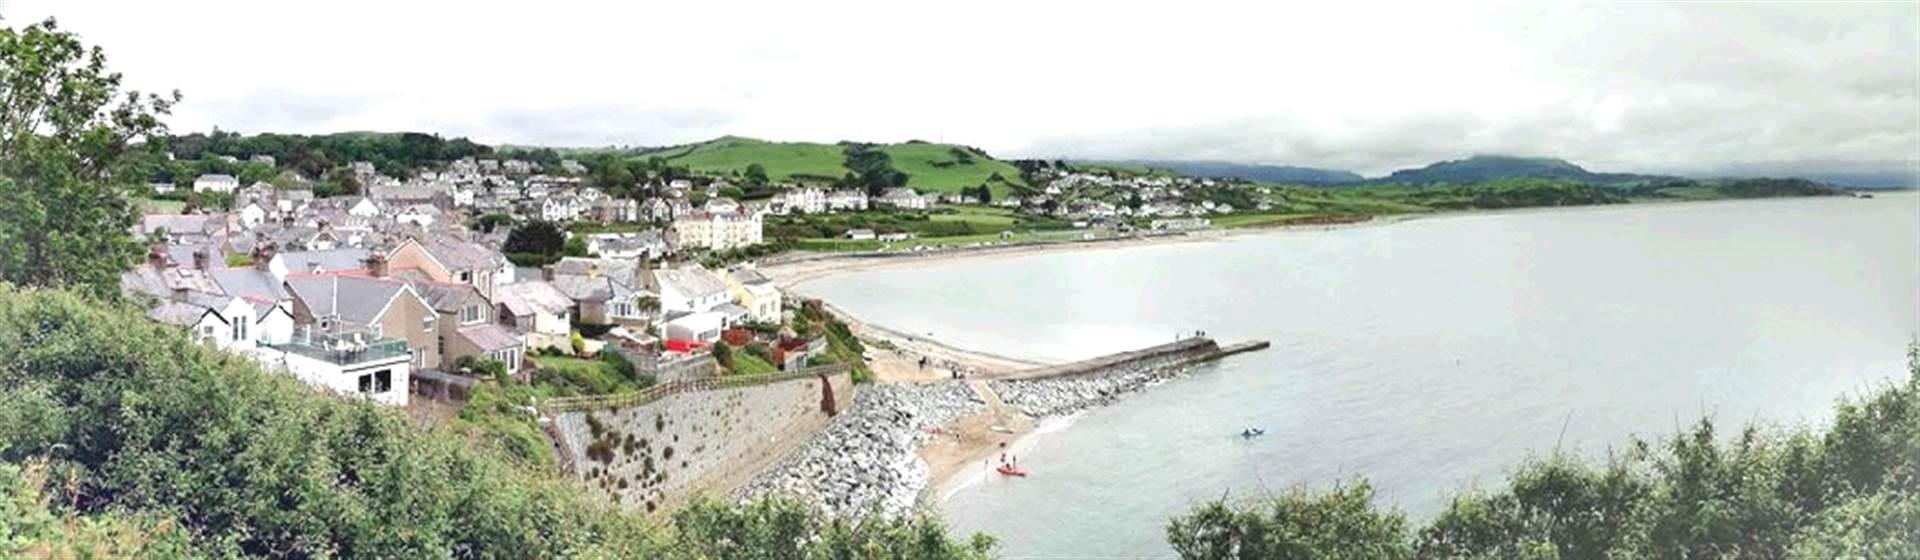 Criccieth - Pearl of Wales